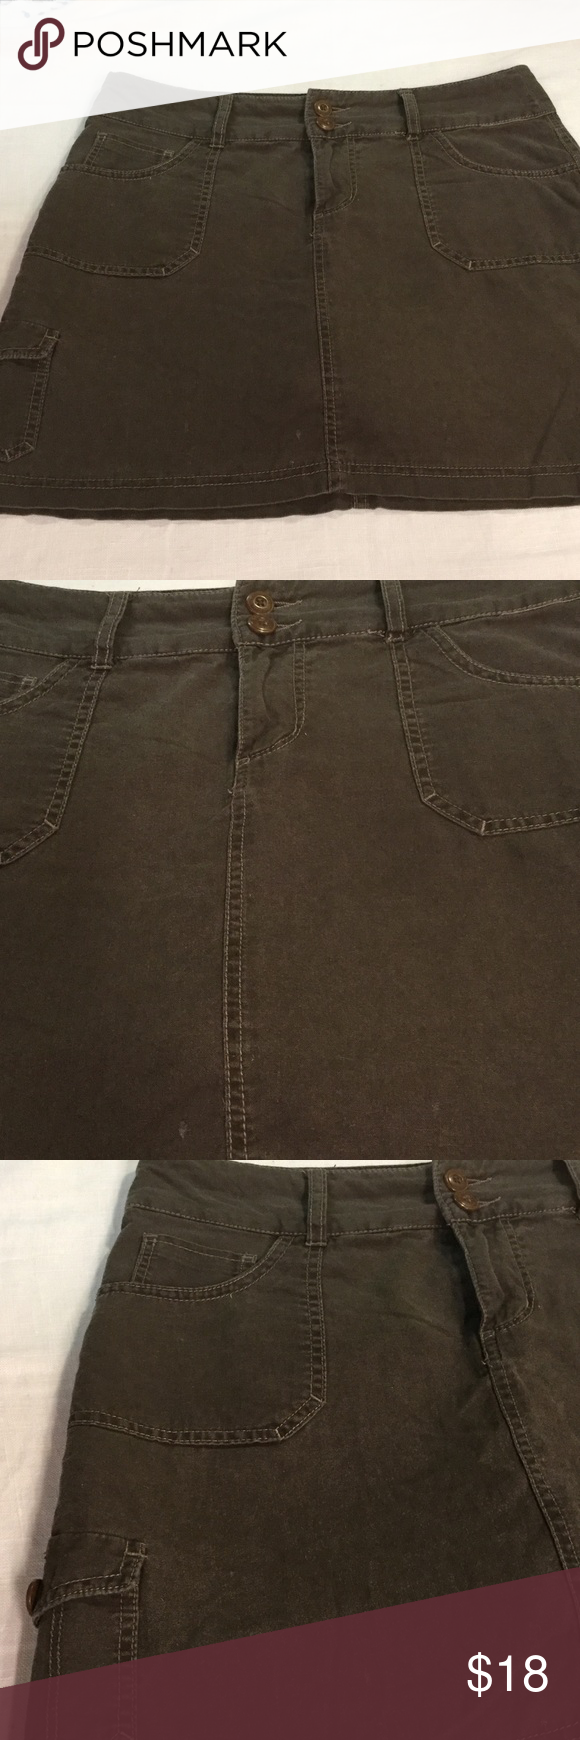 "Sonoma linen cotton blend 6 shirt Ex.used condition..measures 33"" waist..16"" length..SKORT..SHORTS BELOW Sonoma Shorts Skorts"